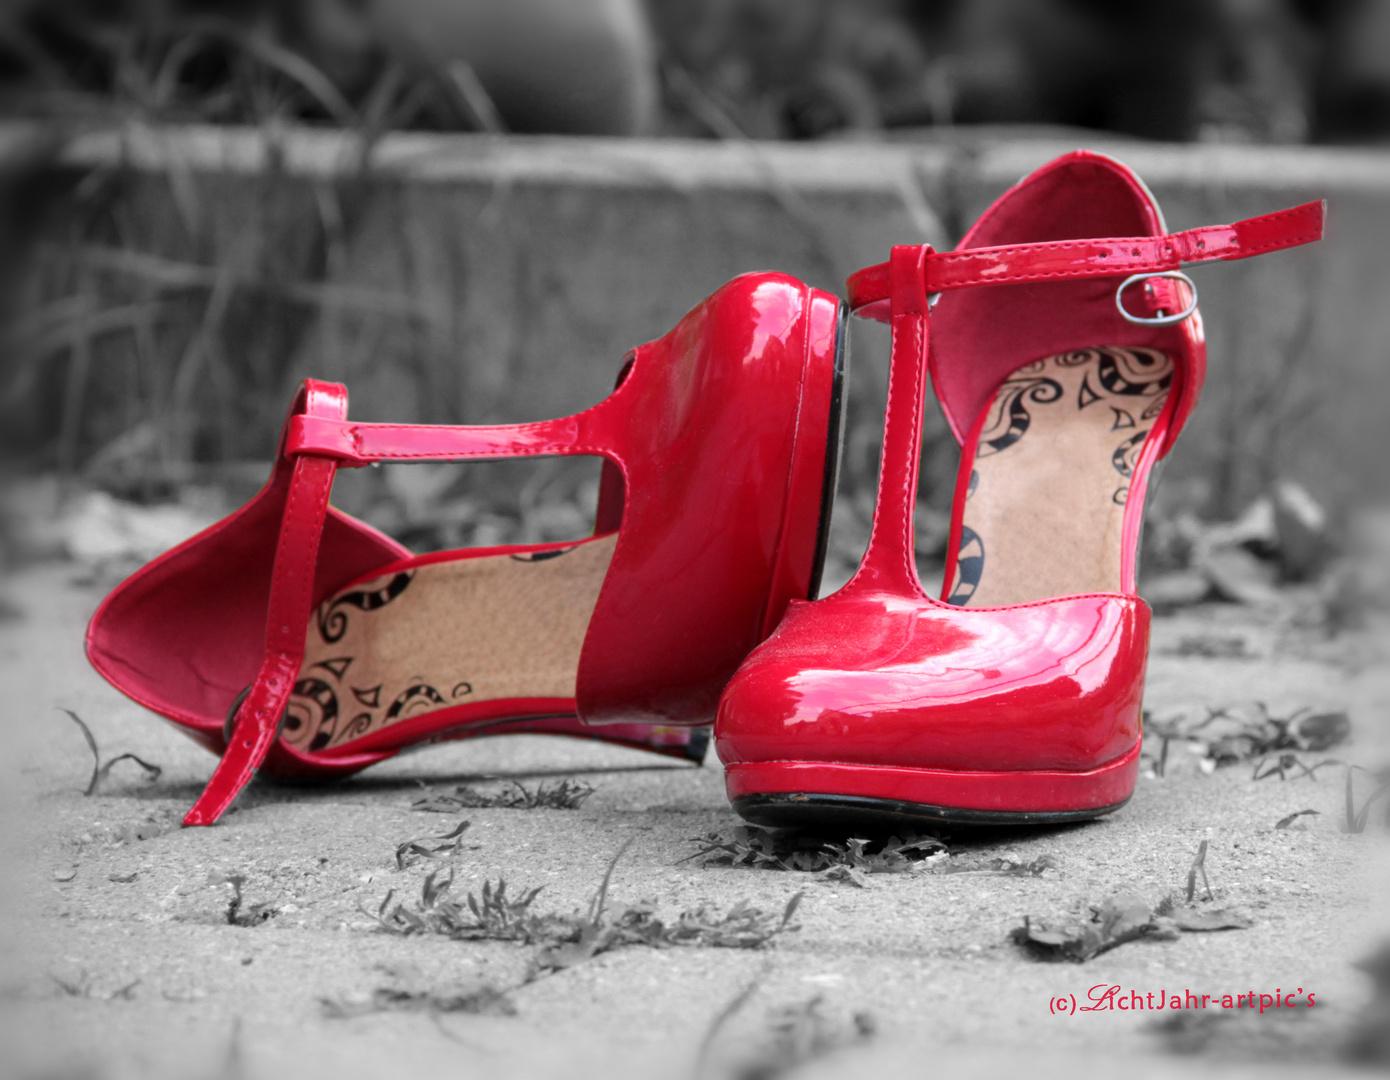 ... rote Schuhe ...